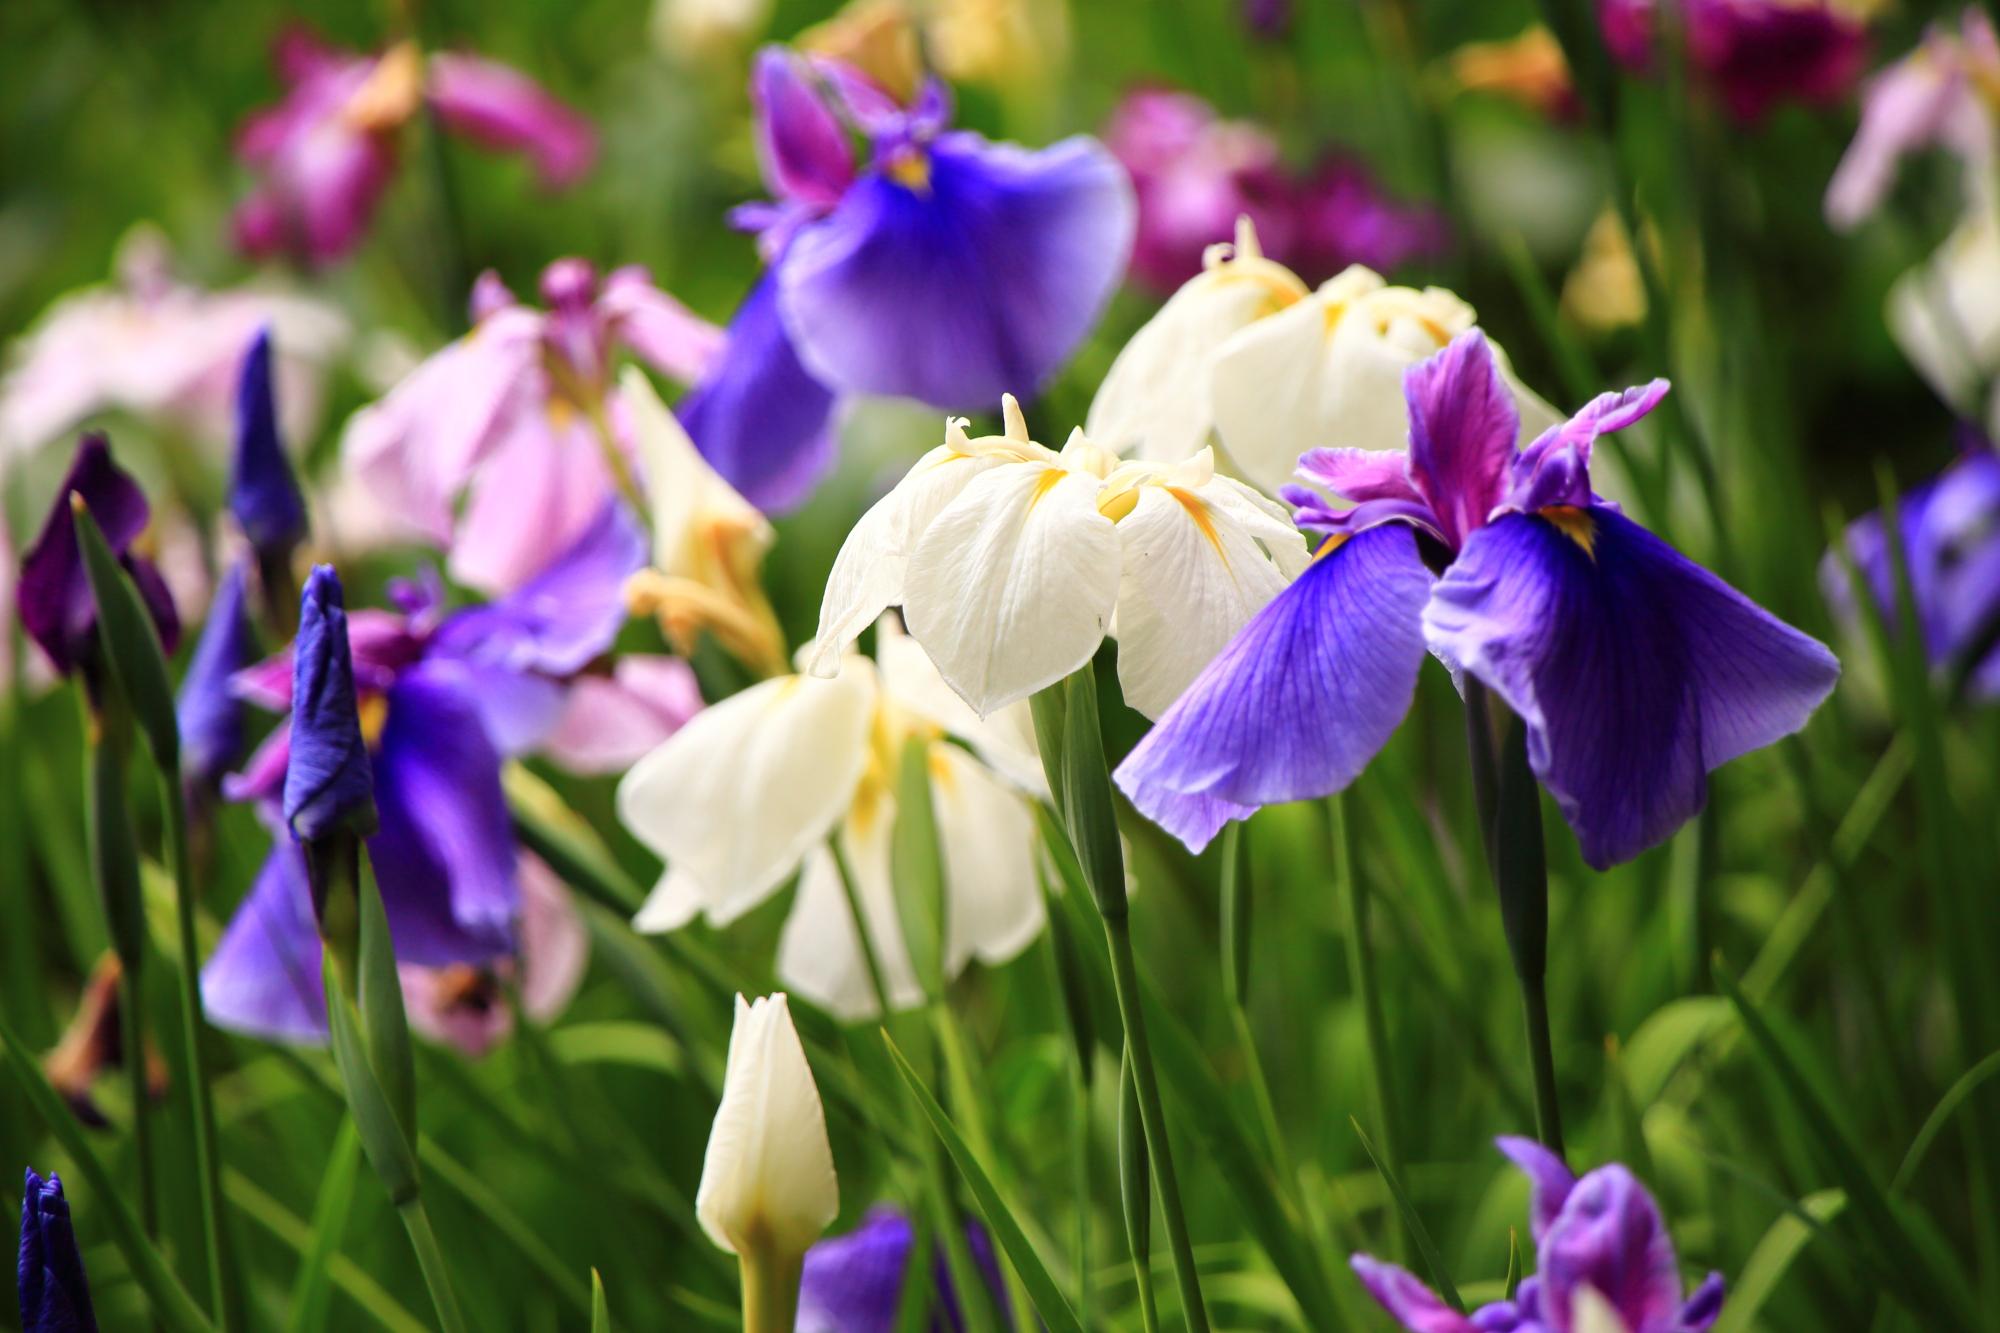 元気に咲き誇る多様な花菖蒲